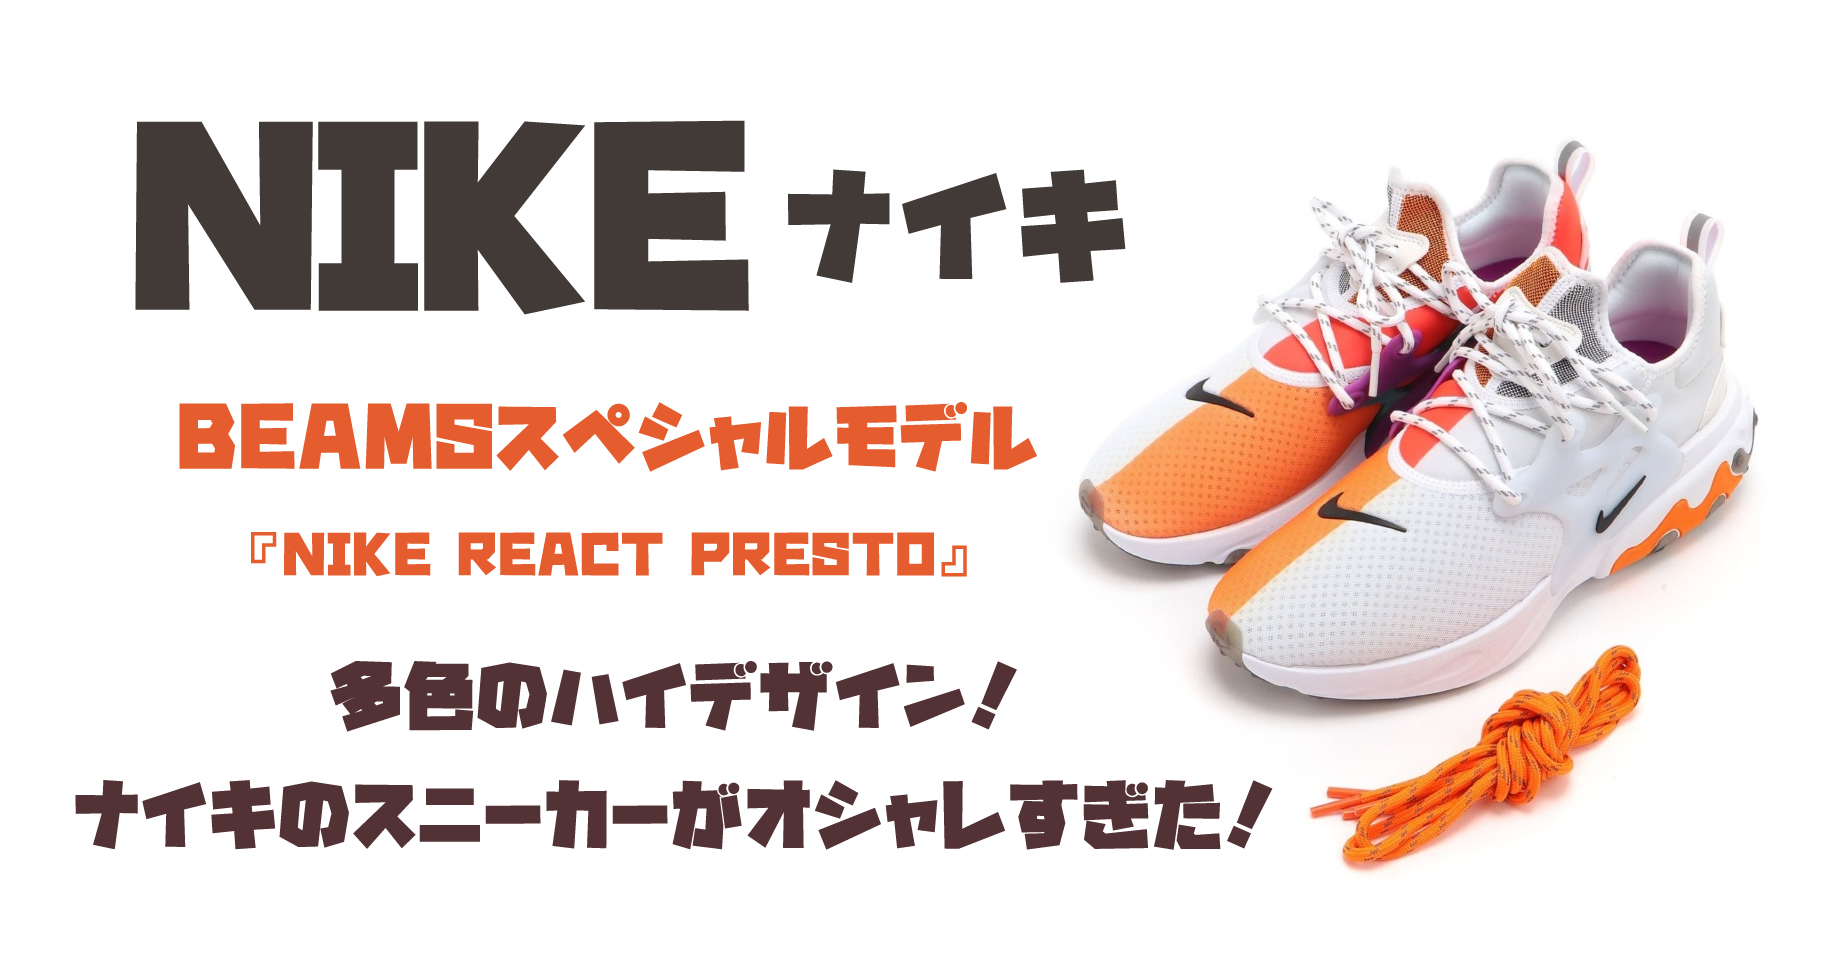 【NIKE】多色のハイデザイン!ナイキのスニーカーがオシャレすぎた!